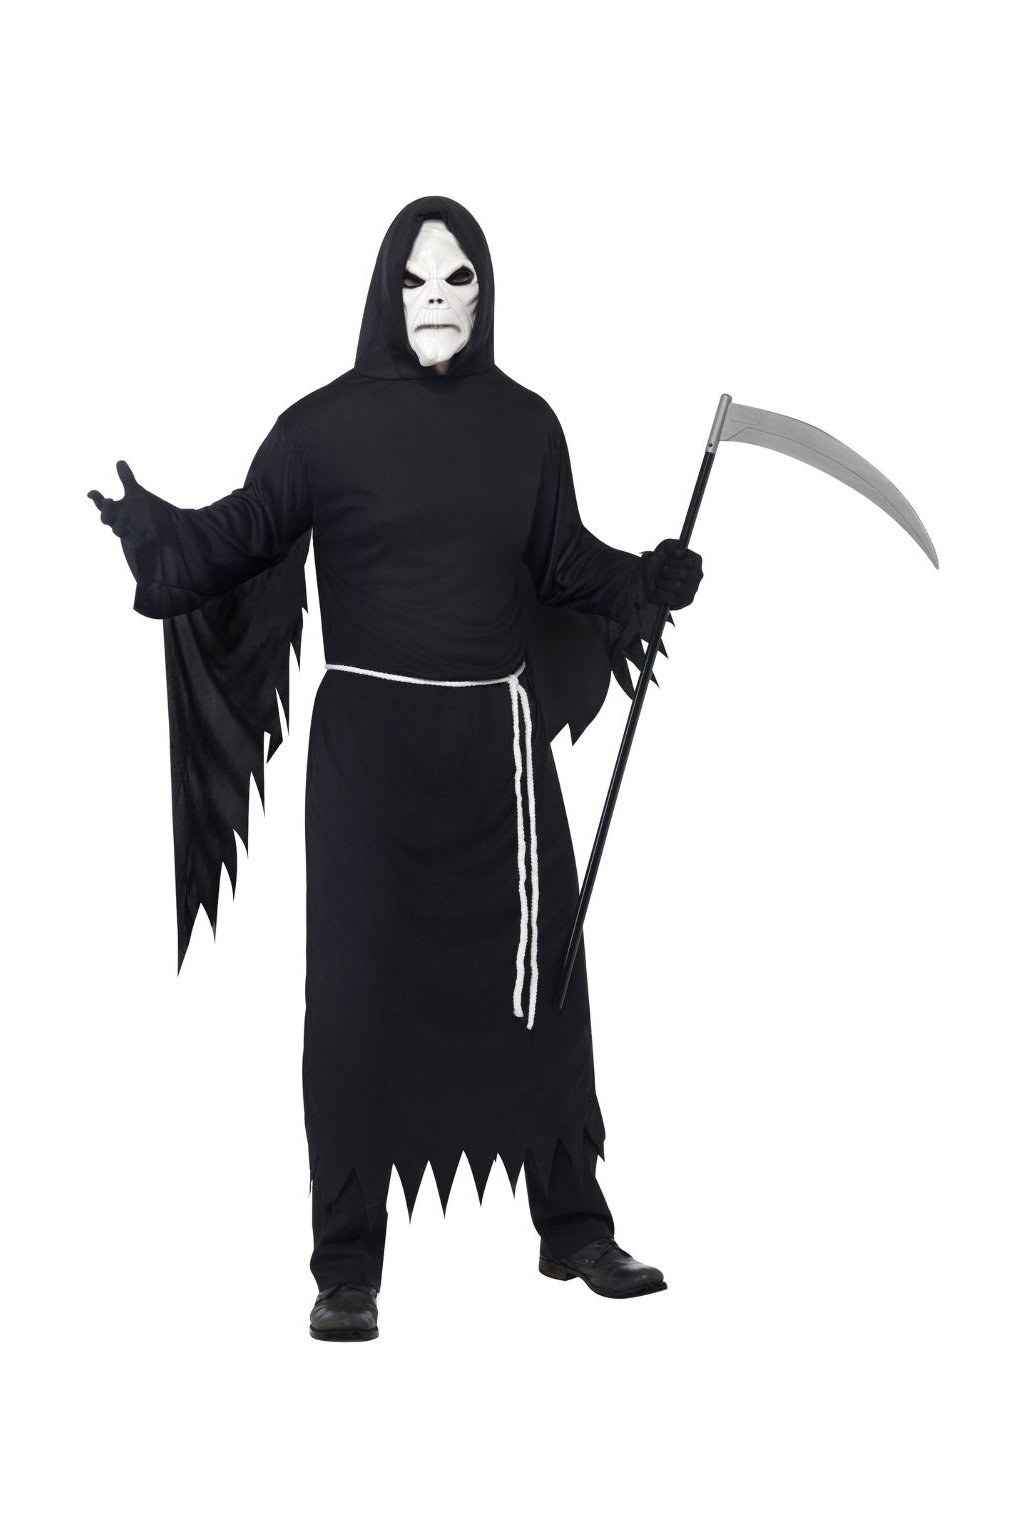 Halloweenský kostým Smrťák s maskou